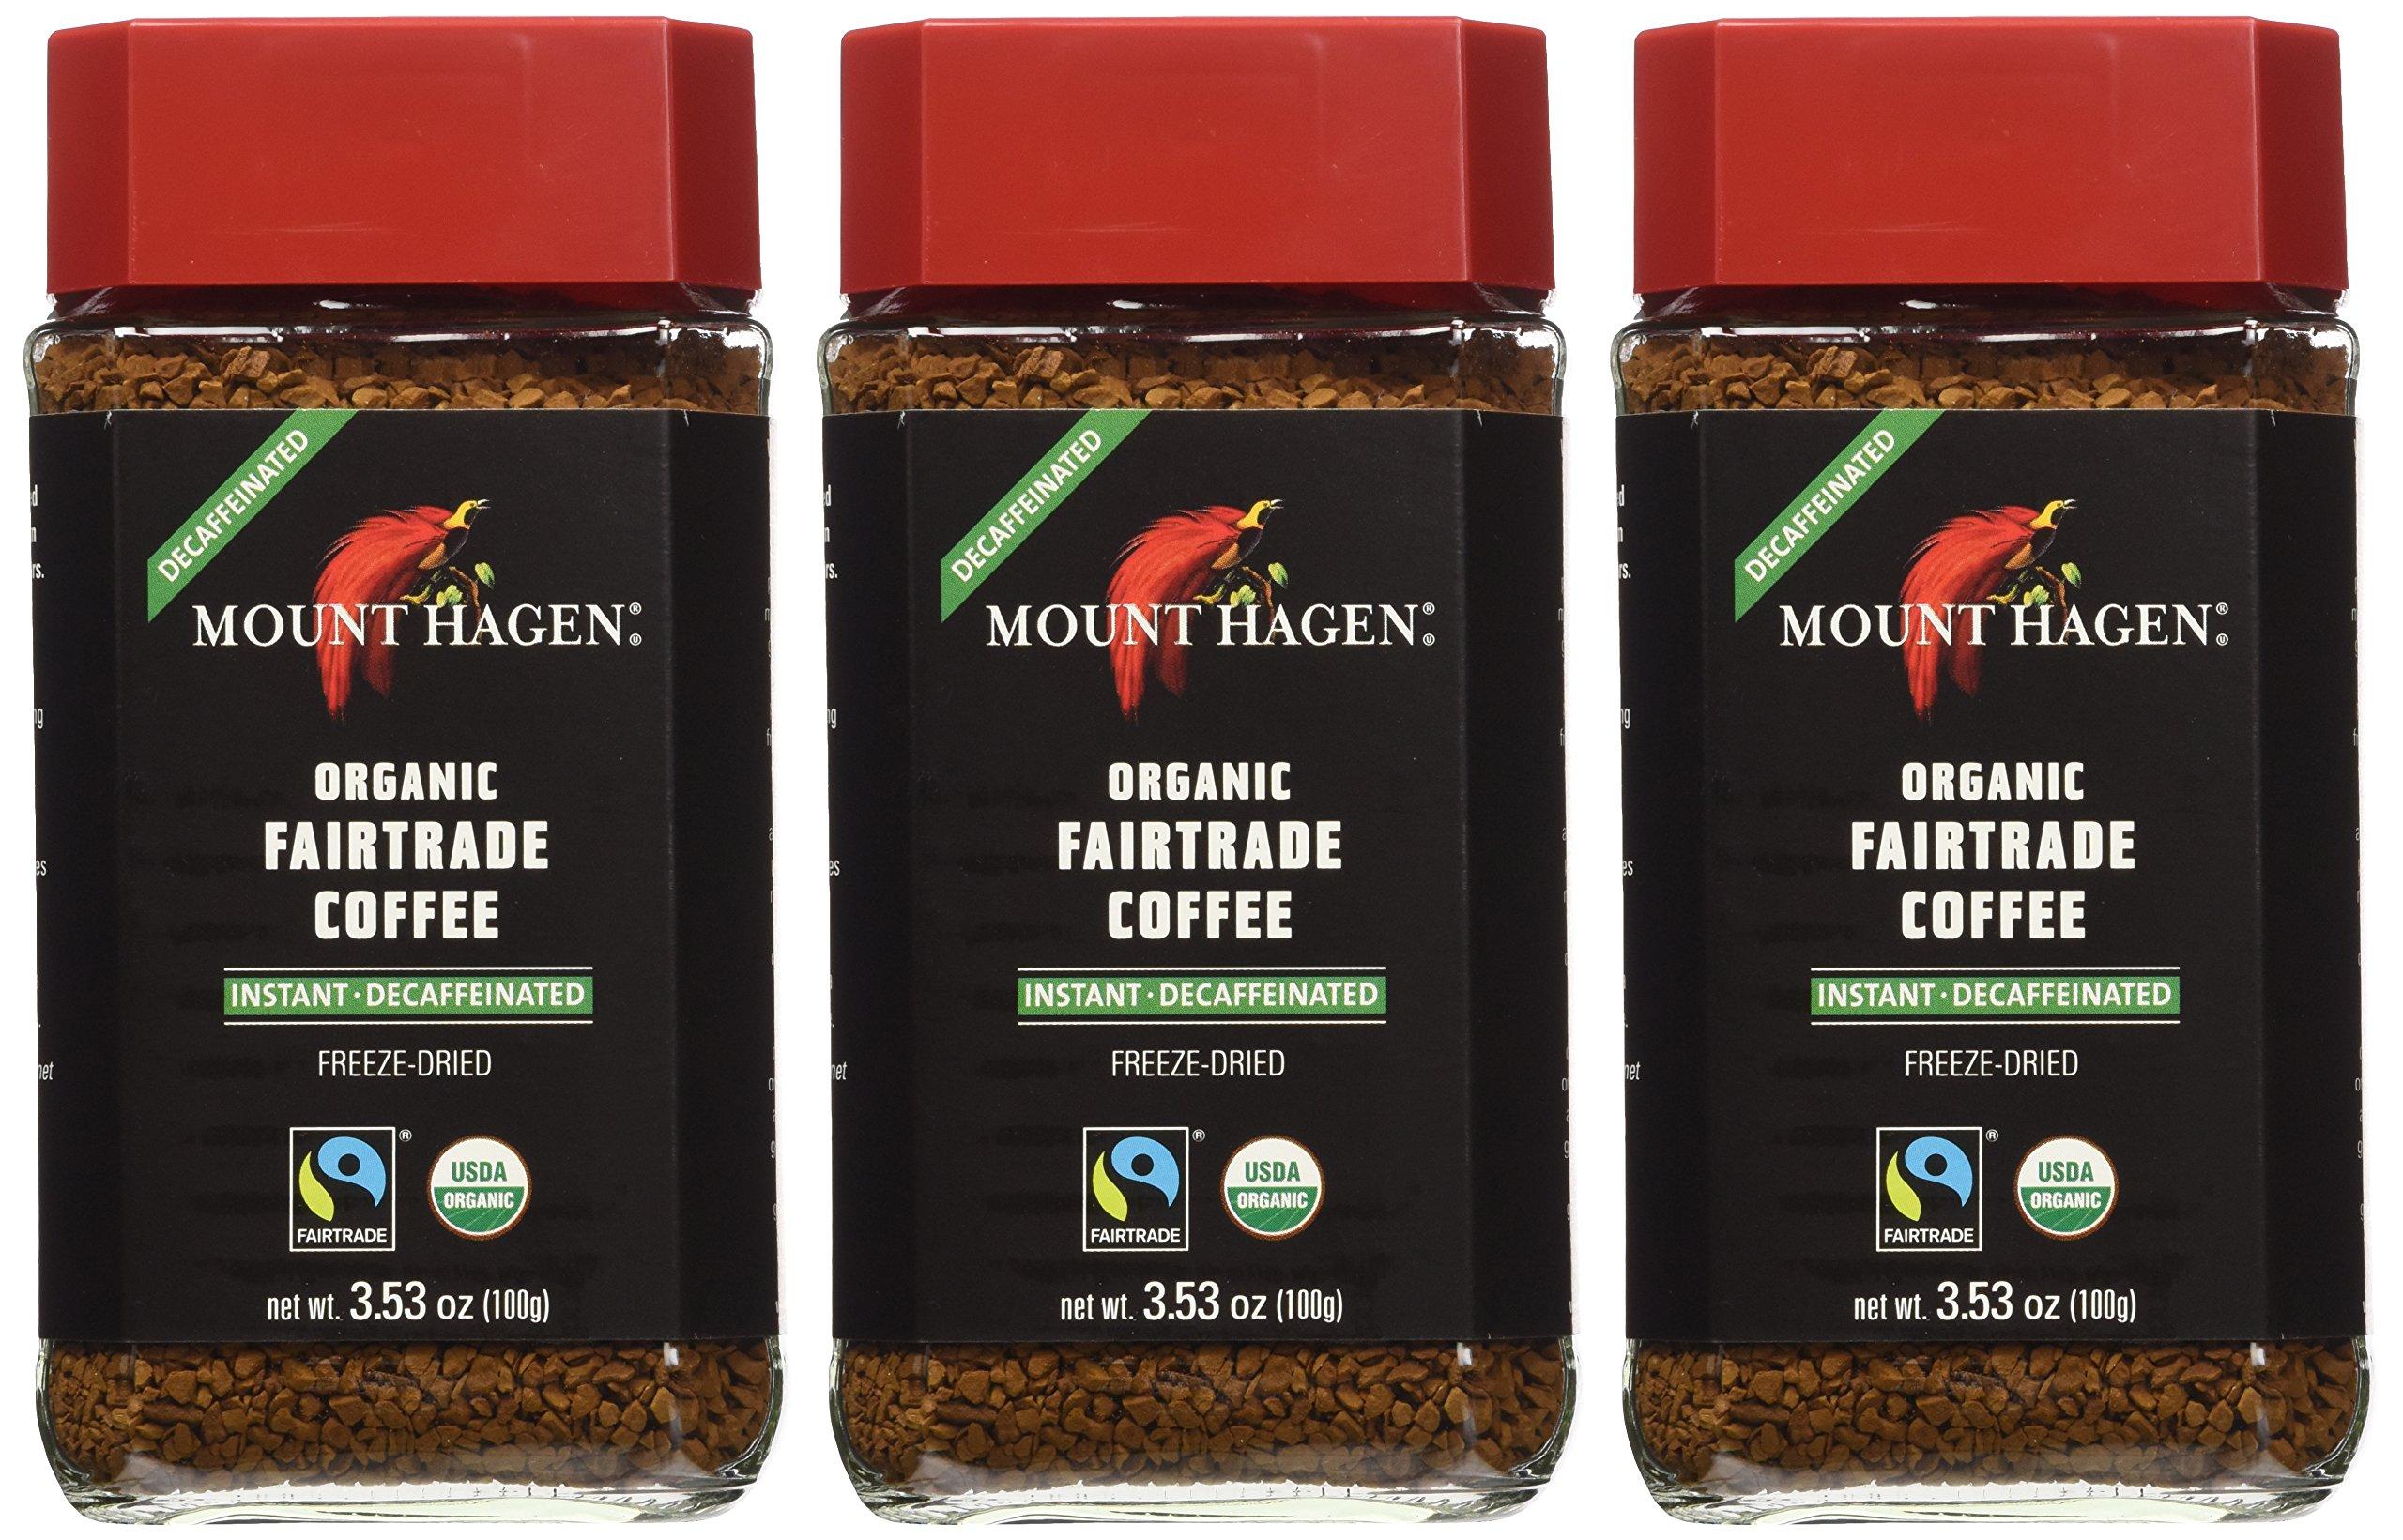 Mount Hagen: Organic Café Decaffeinated Freeze Dried Instant Coffee (3 X 3.53 Oz) (Pack of 3) by Mount Hagen